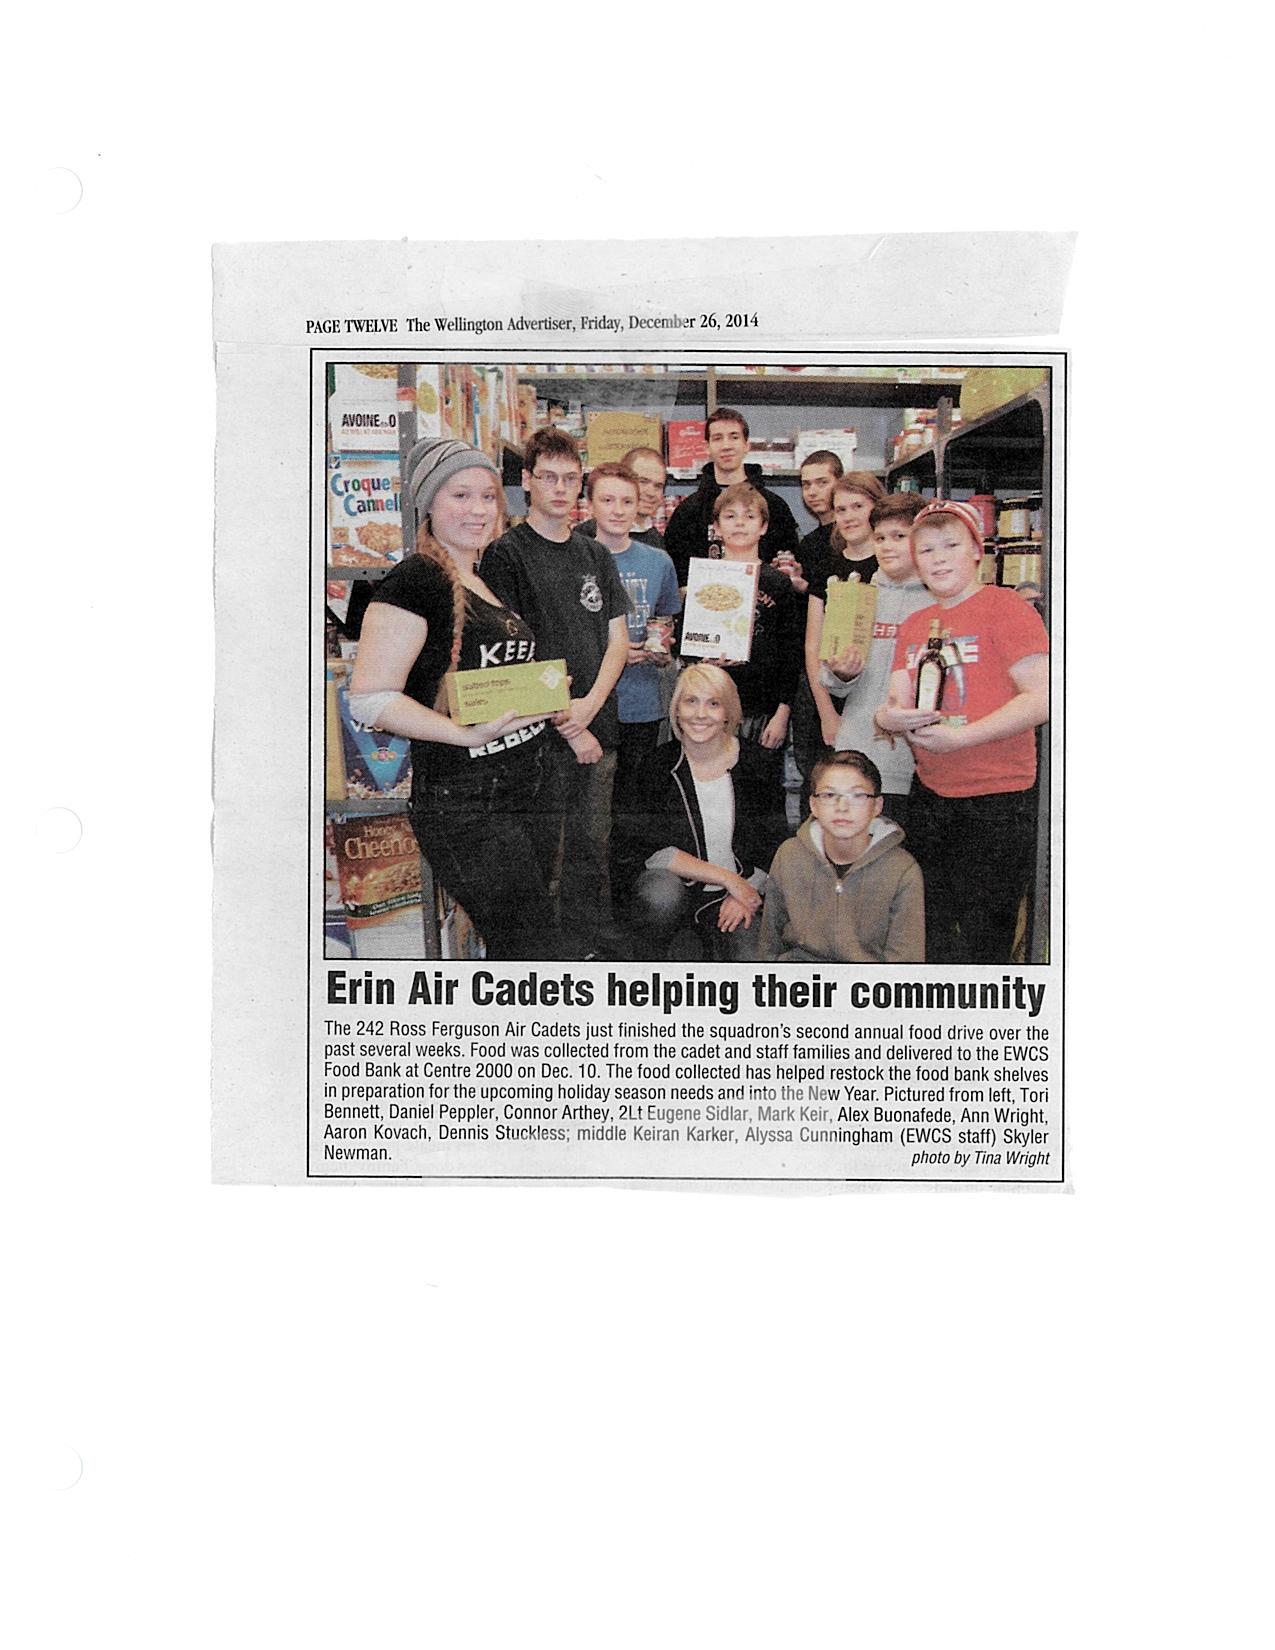 Erin Air Cadets Helping Their Community - Dec 26 2014 Wellington Advertiser.jpg